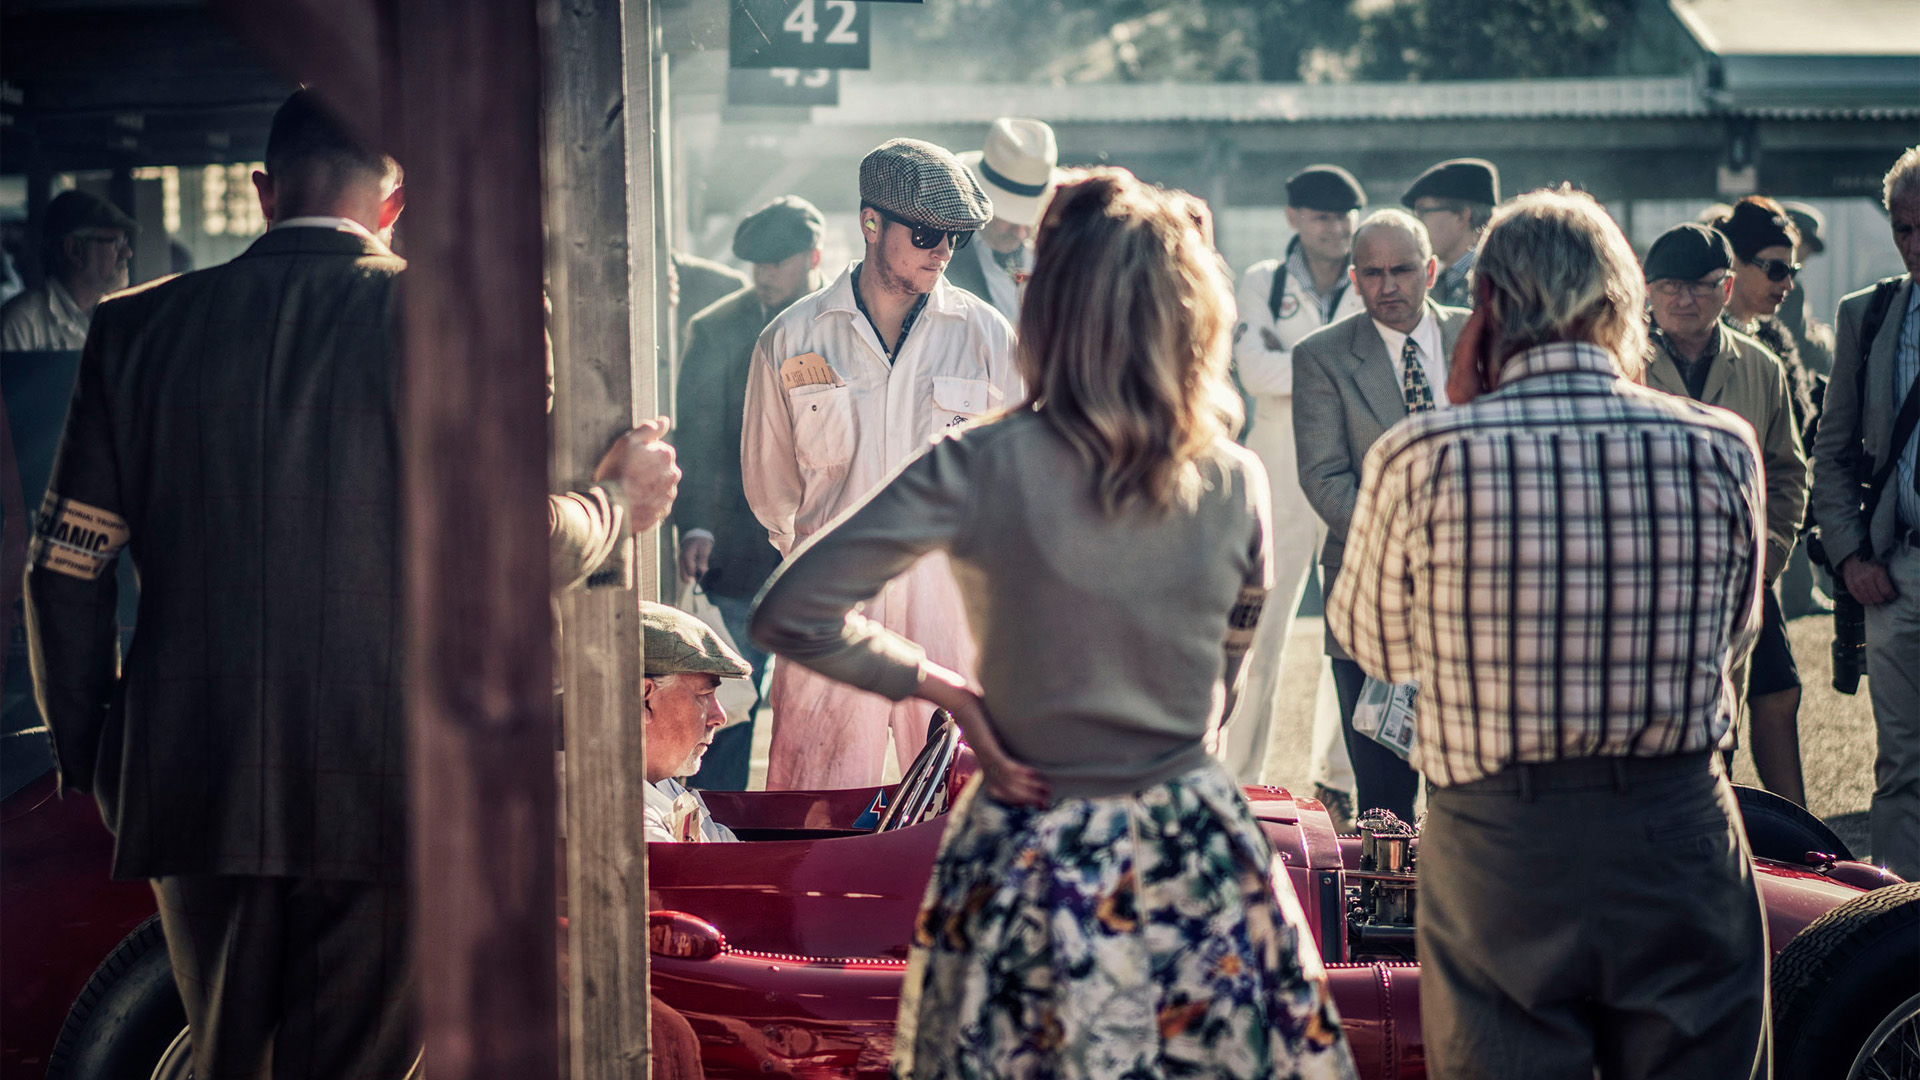 Nigel Harniman Goodwood revival ferrari pits